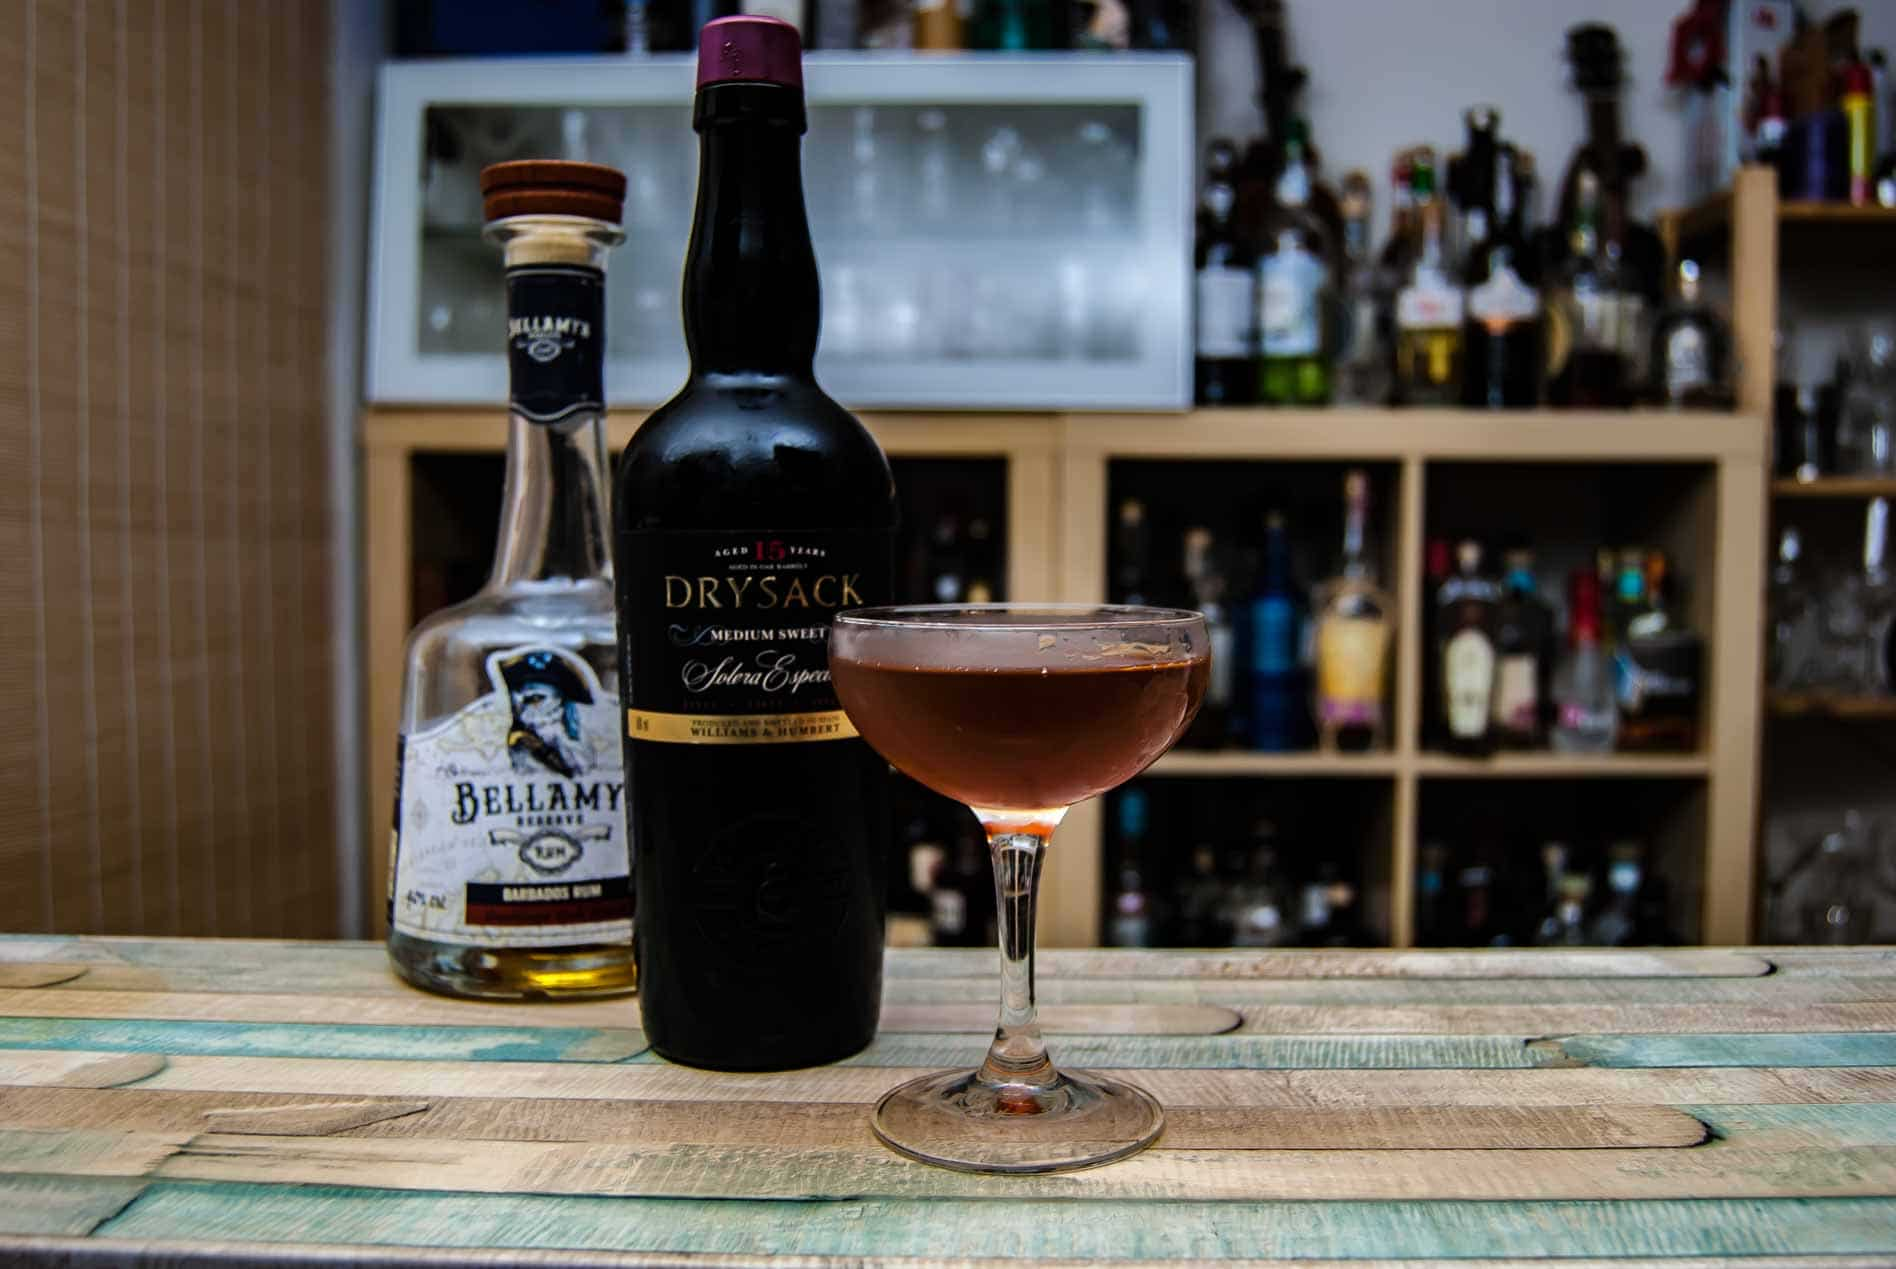 Williams & Humbert Drysack Medium Sweet Sherry in einem Dunlop Cocktail mit Bellamy's Reserve Rum Guadeloupe.